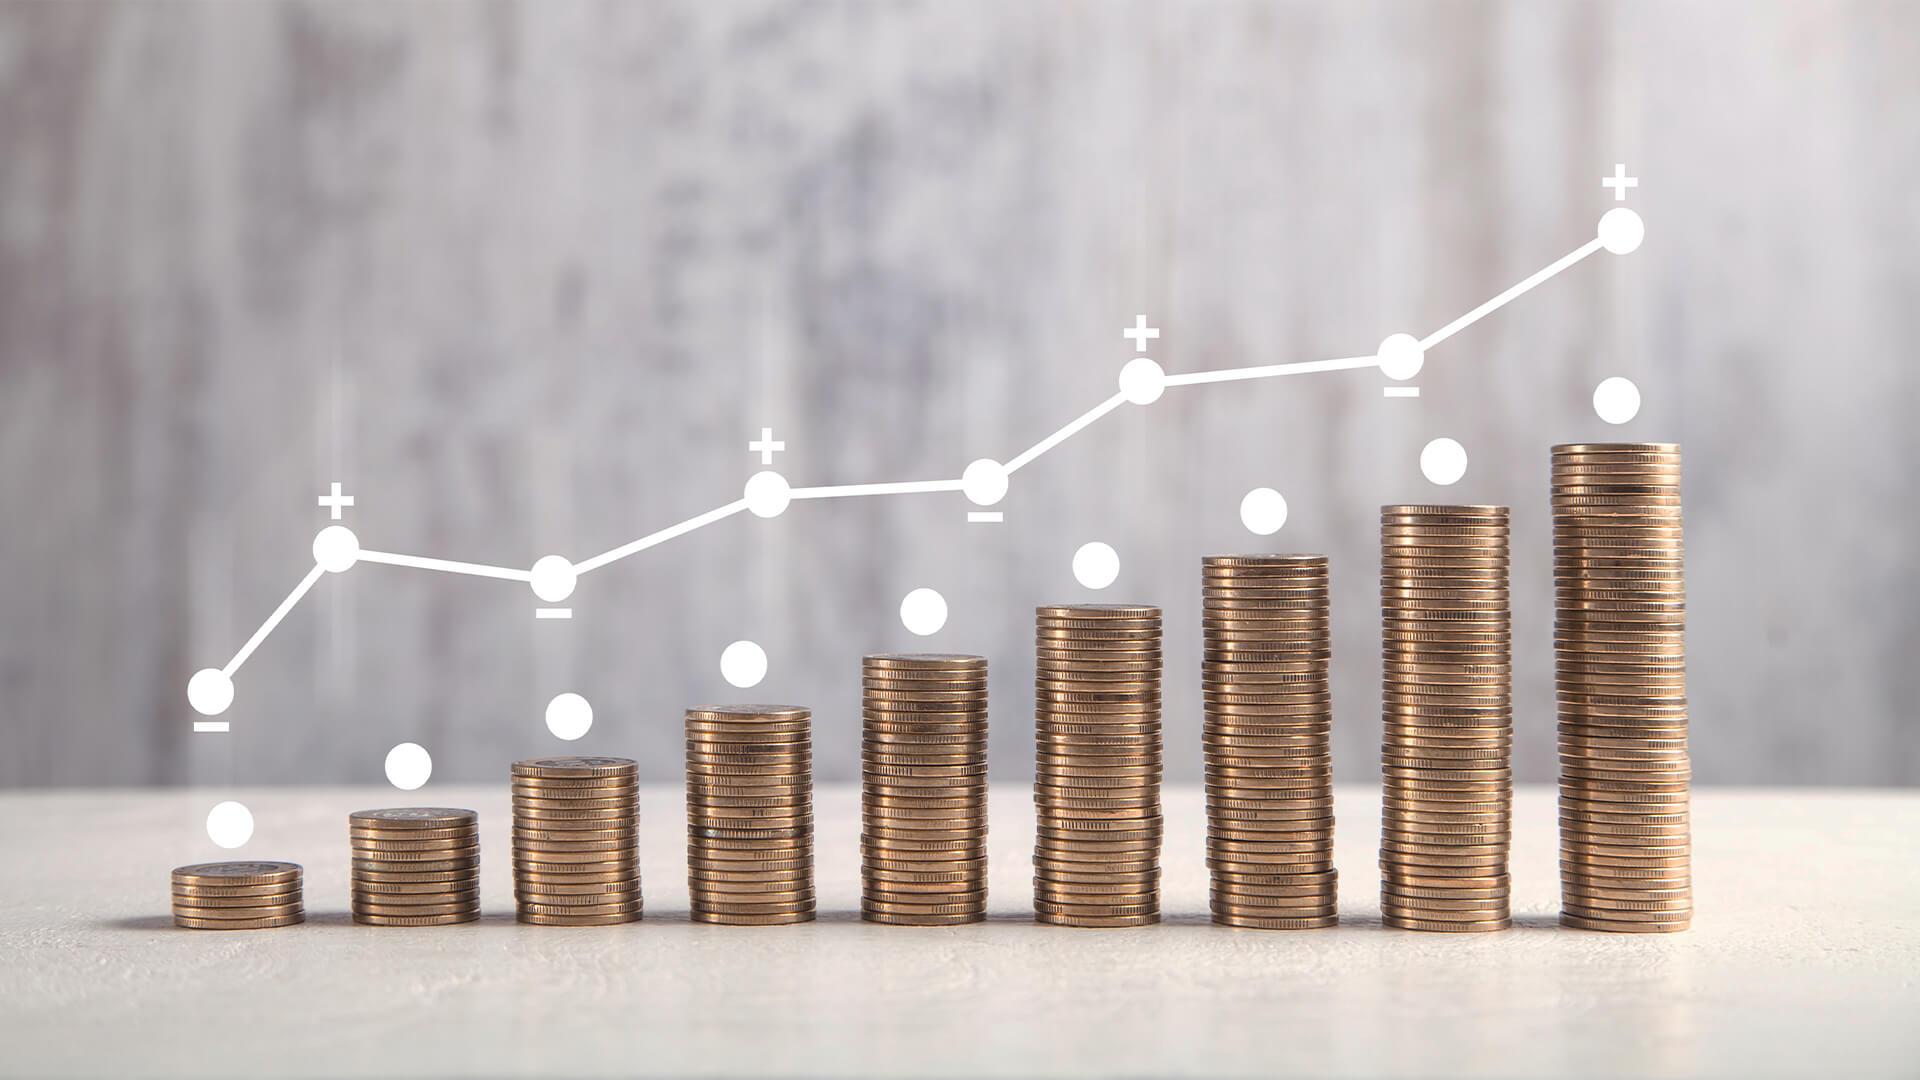 Wealth Growth